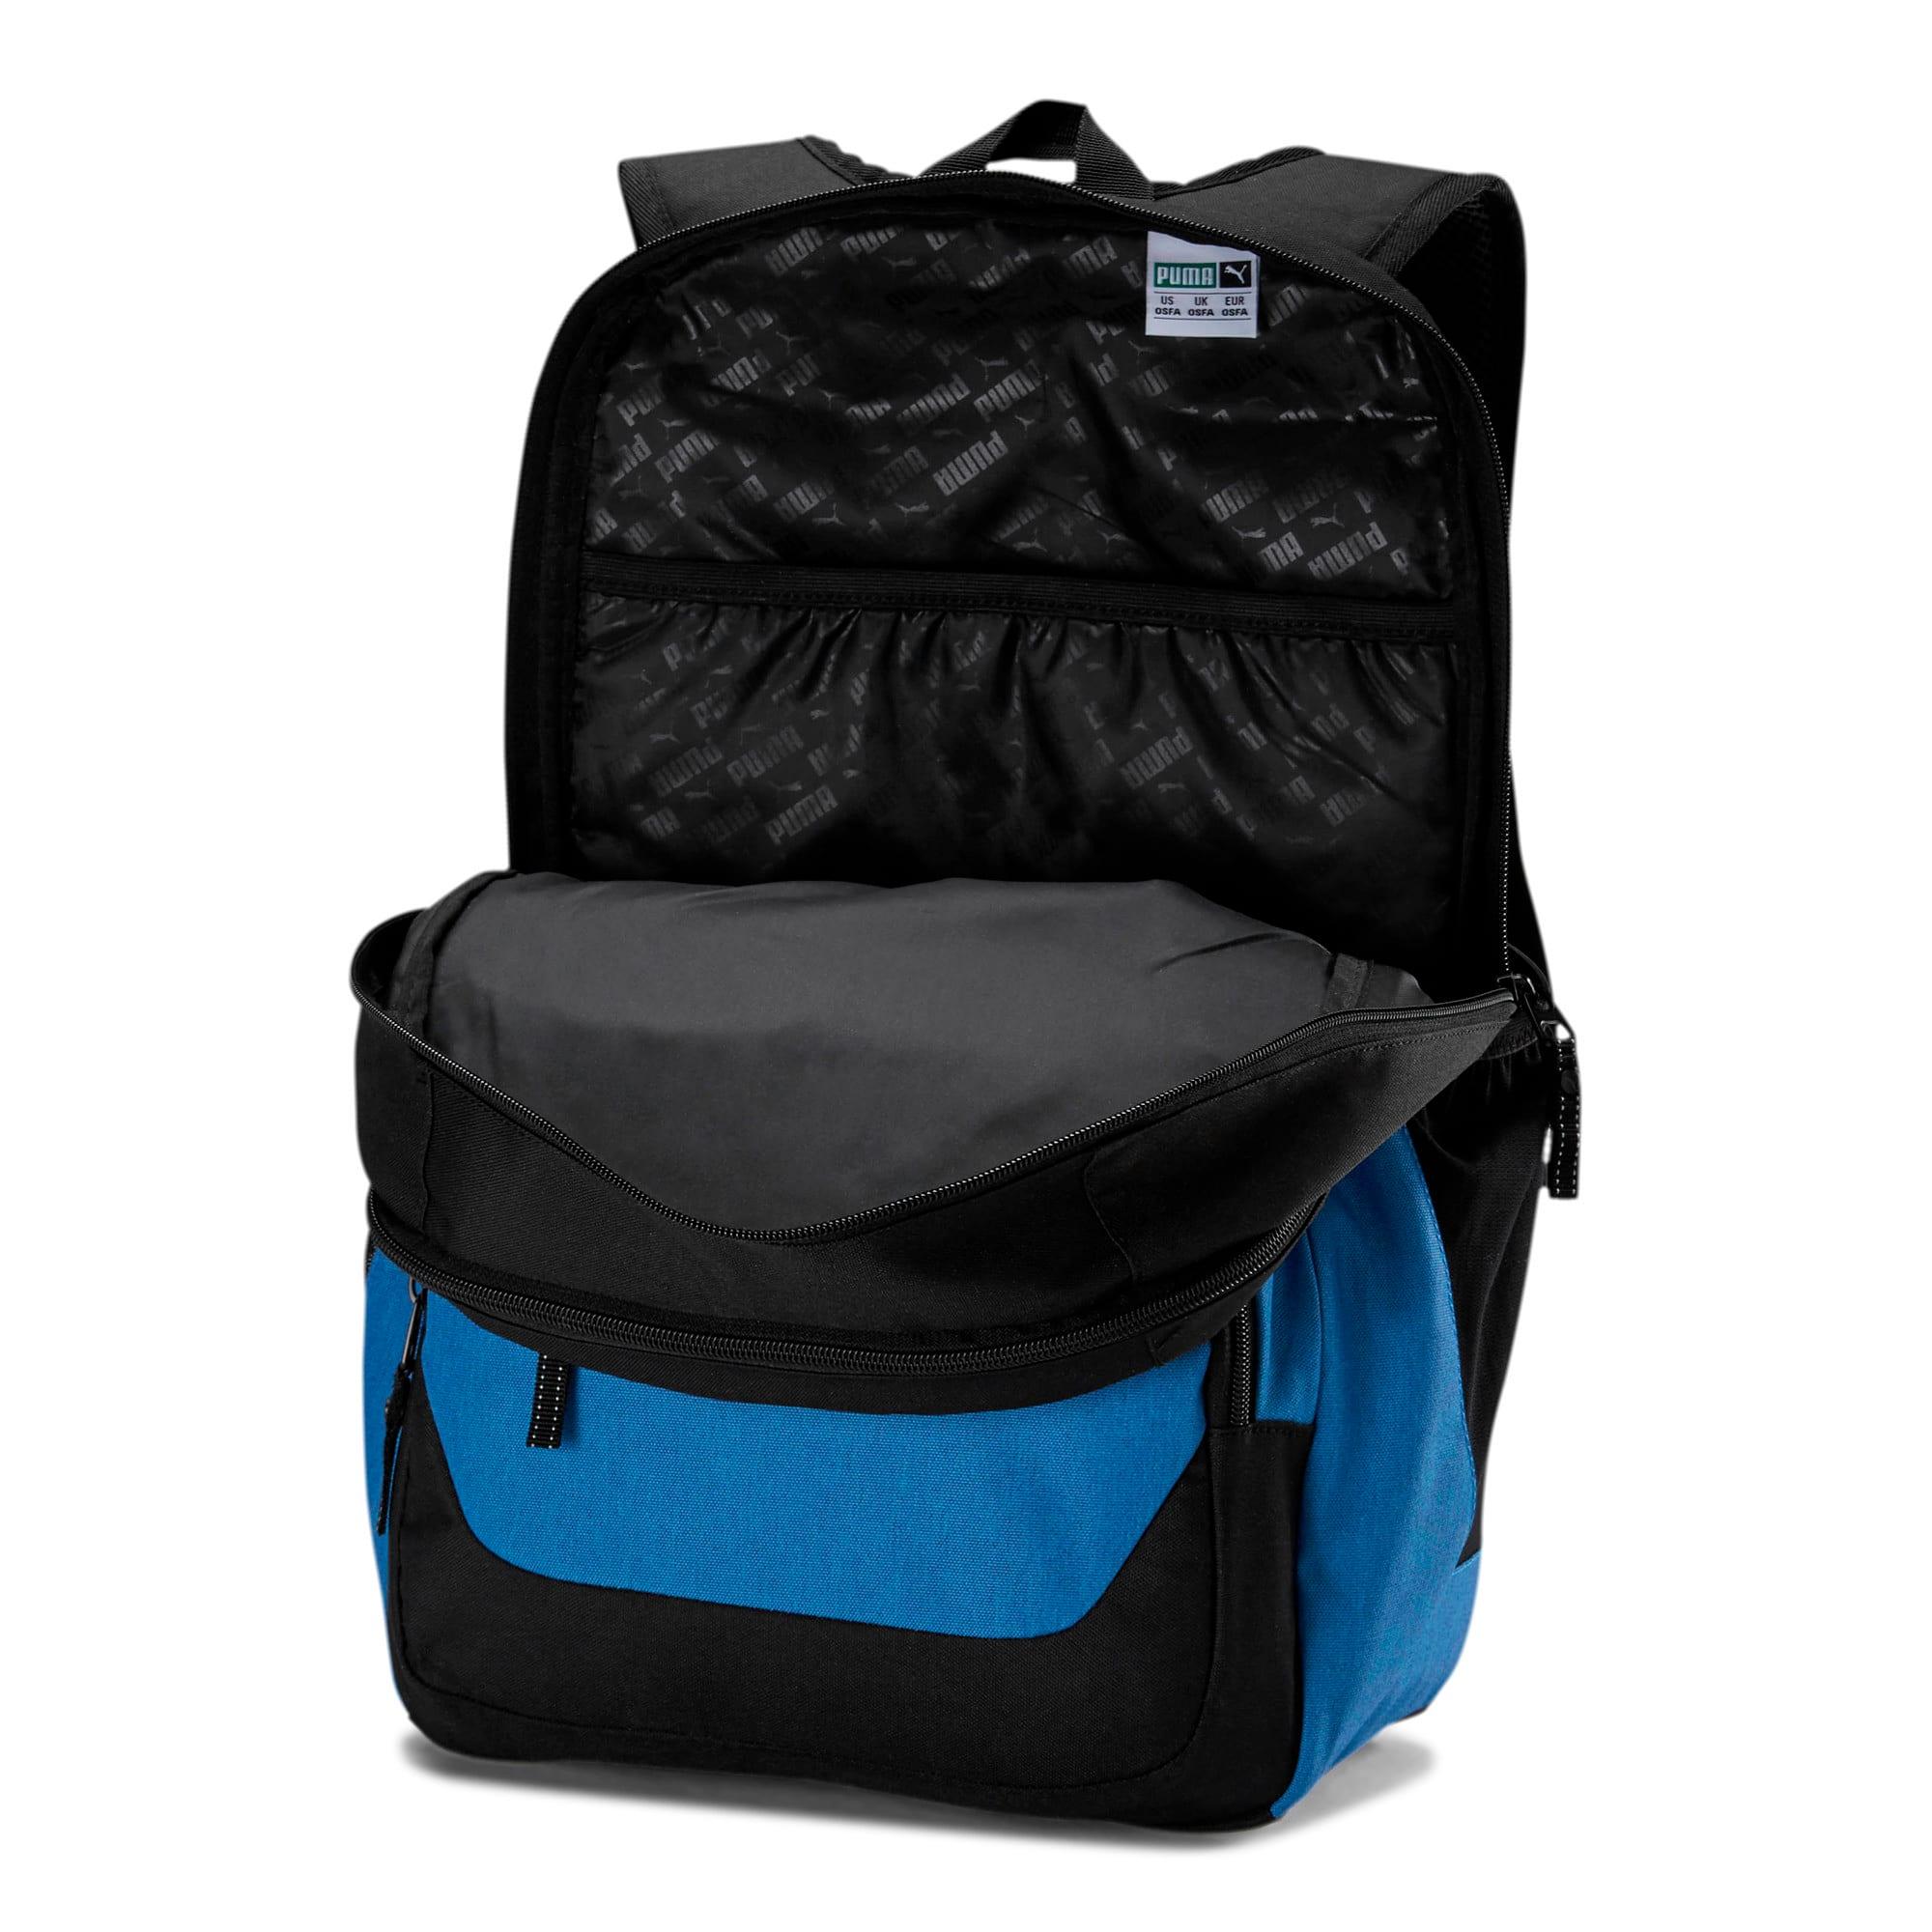 Thumbnail 3 of PUMA Everready Backpack, Blue, medium